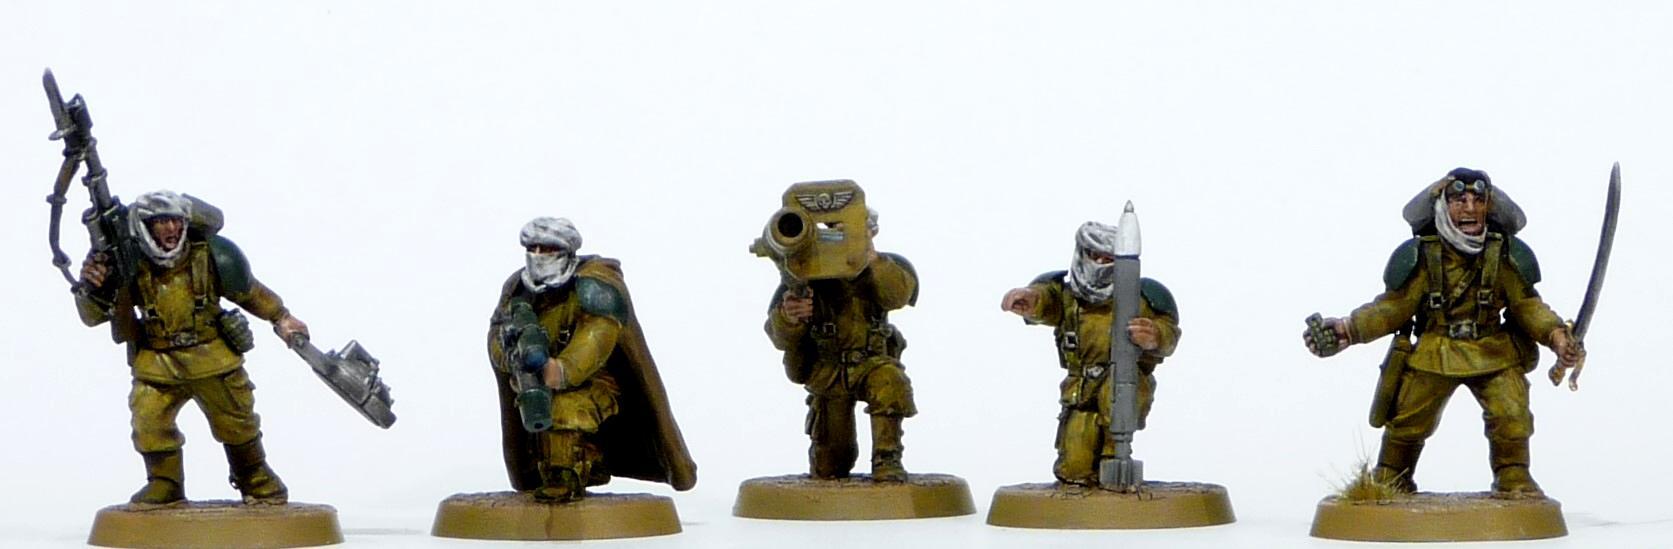 Conversion, Desert Raiders, Imperial Guard, Tallarn Desert Raiders